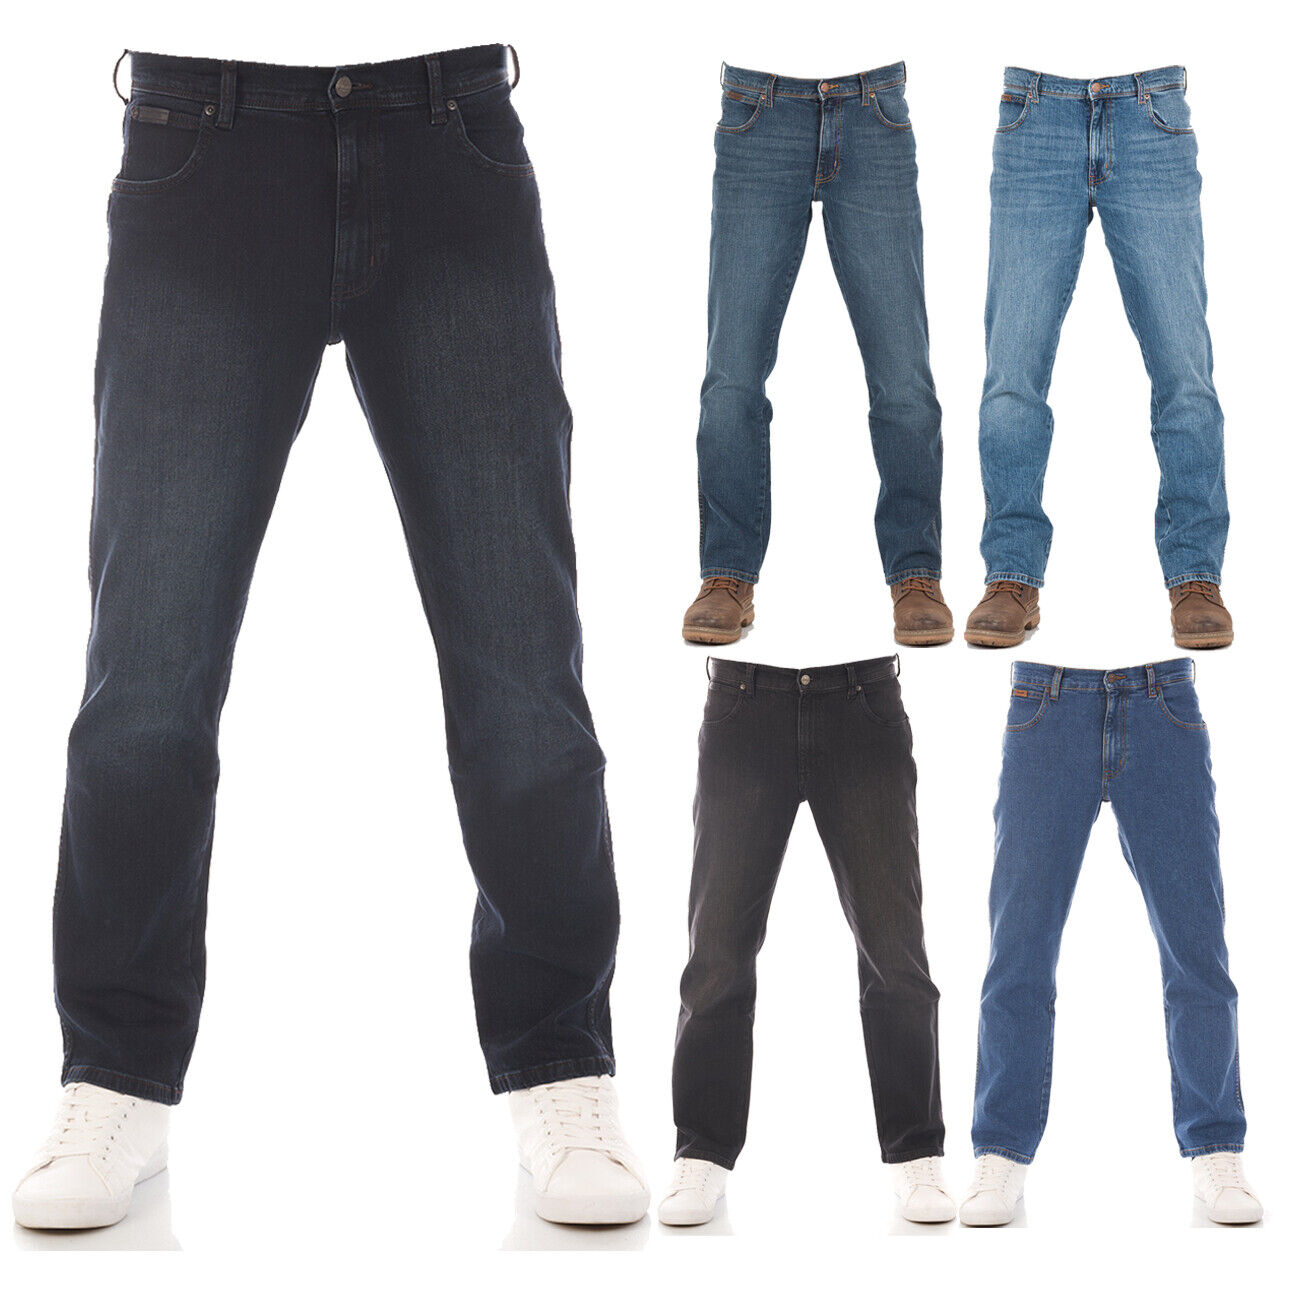 Wrangler Herren Jeans Texas Stretch Regular Straight Hose Blau Schwarz Grau